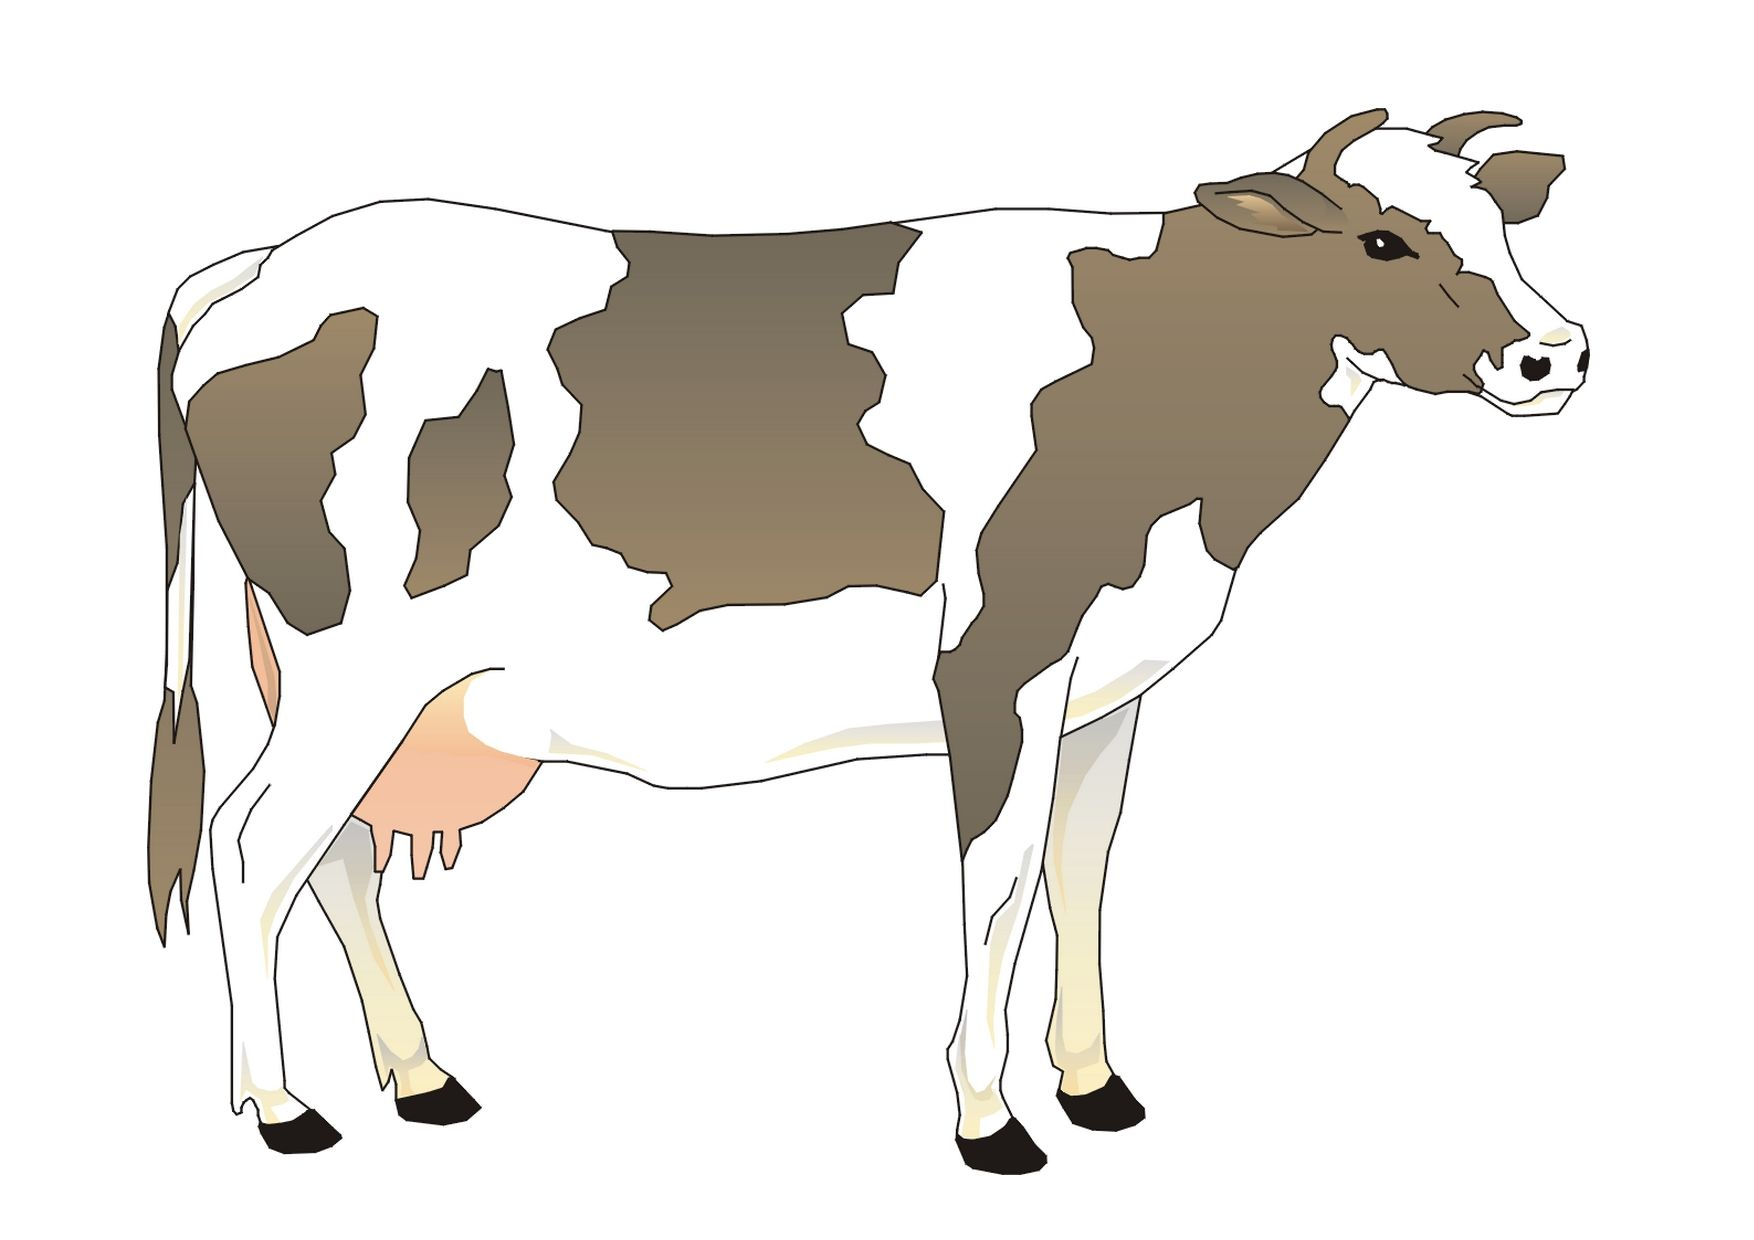 clipart | Thema koe kleuters / Cow theme preschool / Vaches thème ...